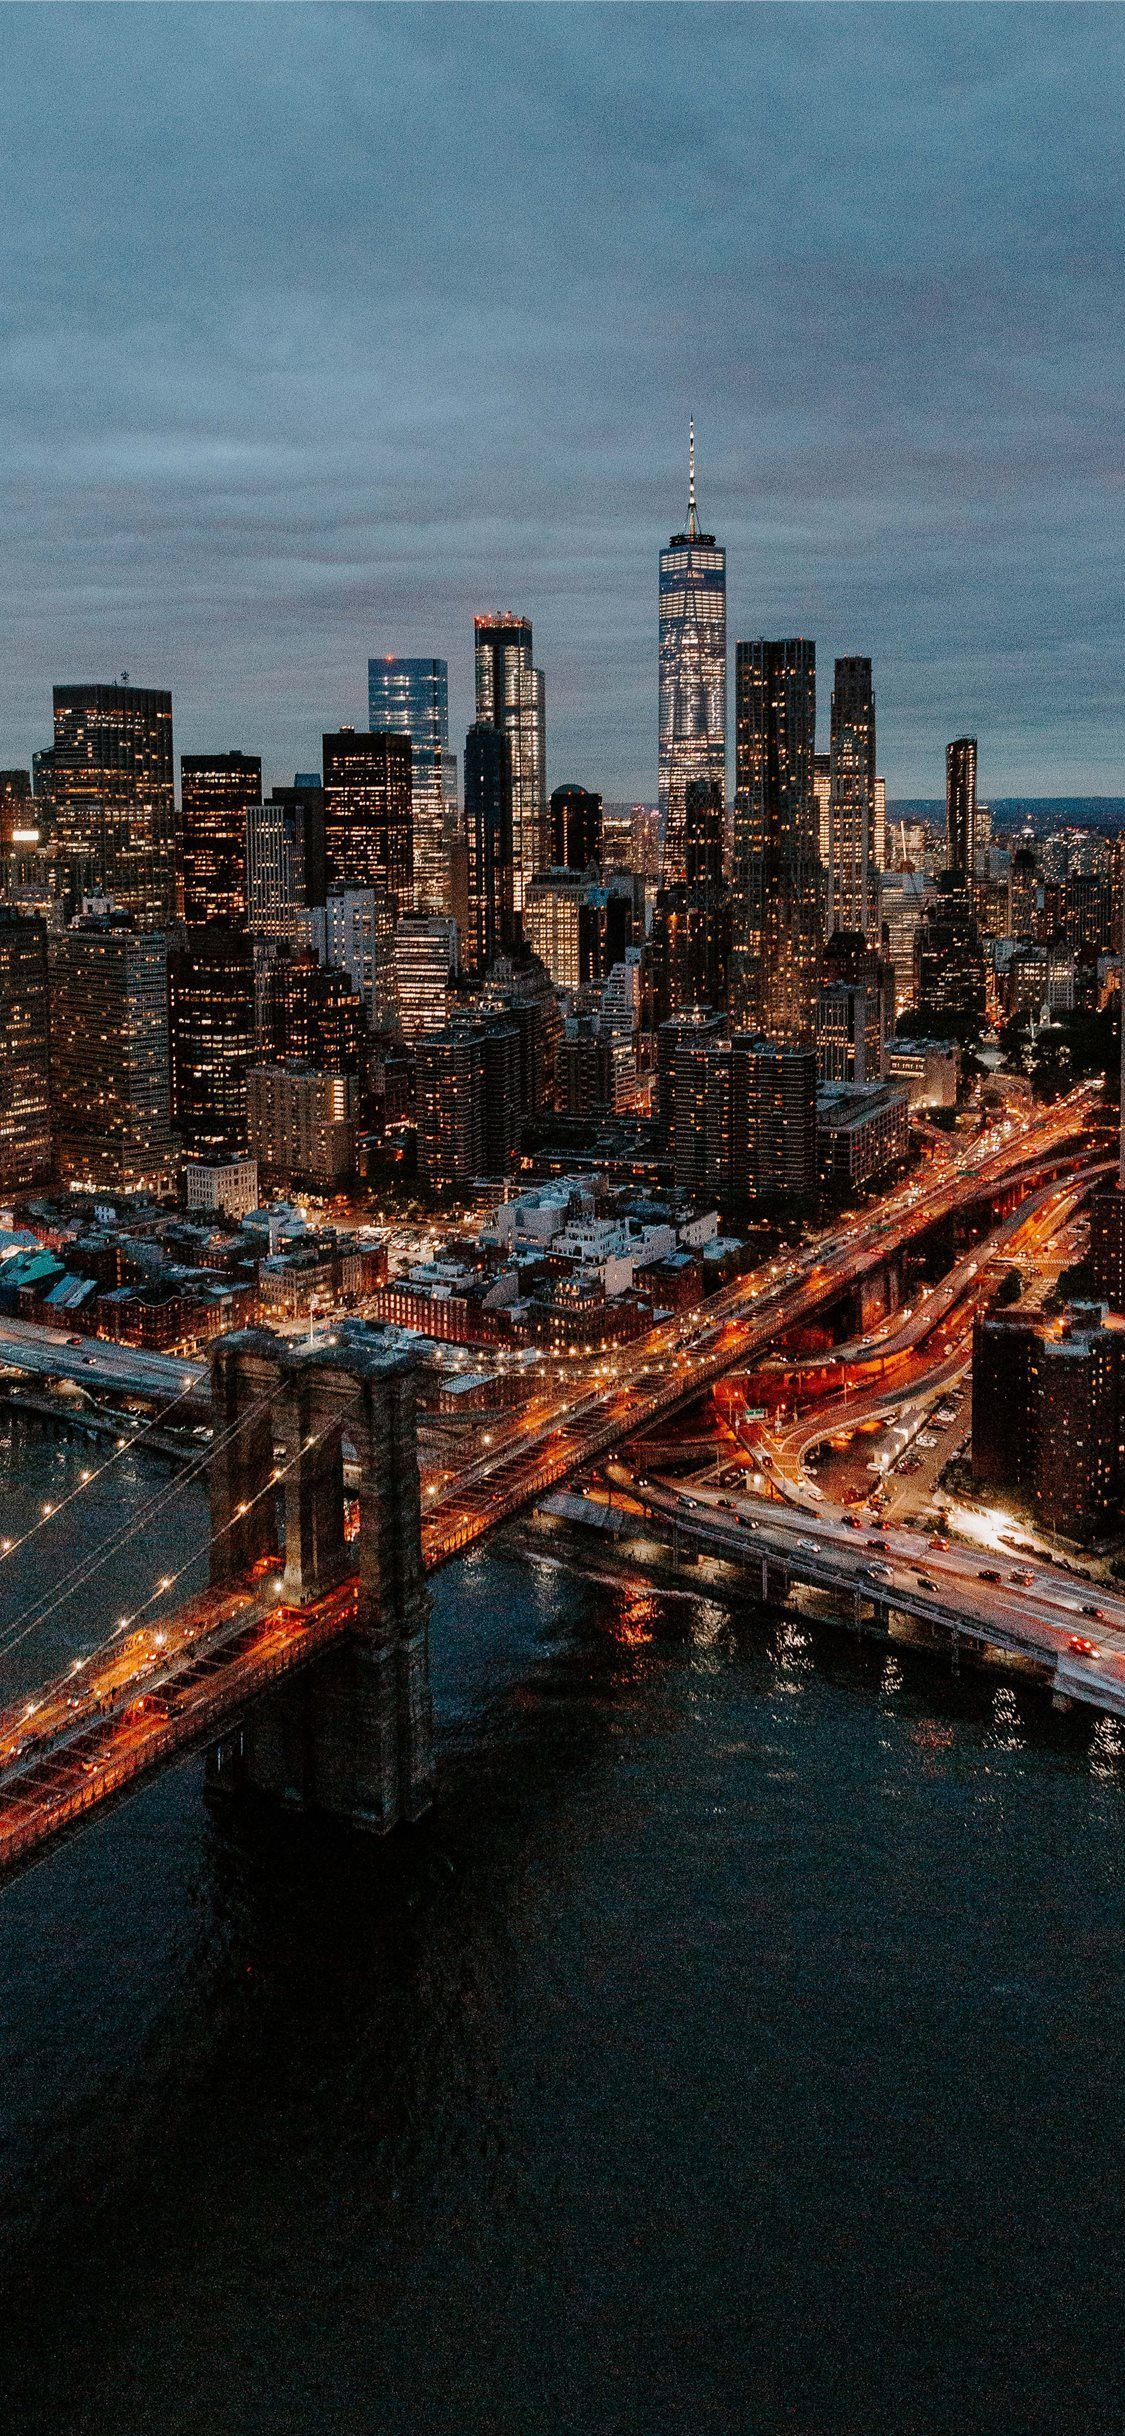 Luftaufnahmen Von Gebauden Und Brucken Iphone 11 Wallpapers In 2020 New York Wallpaper City Aesthetic Bridge Wallpaper